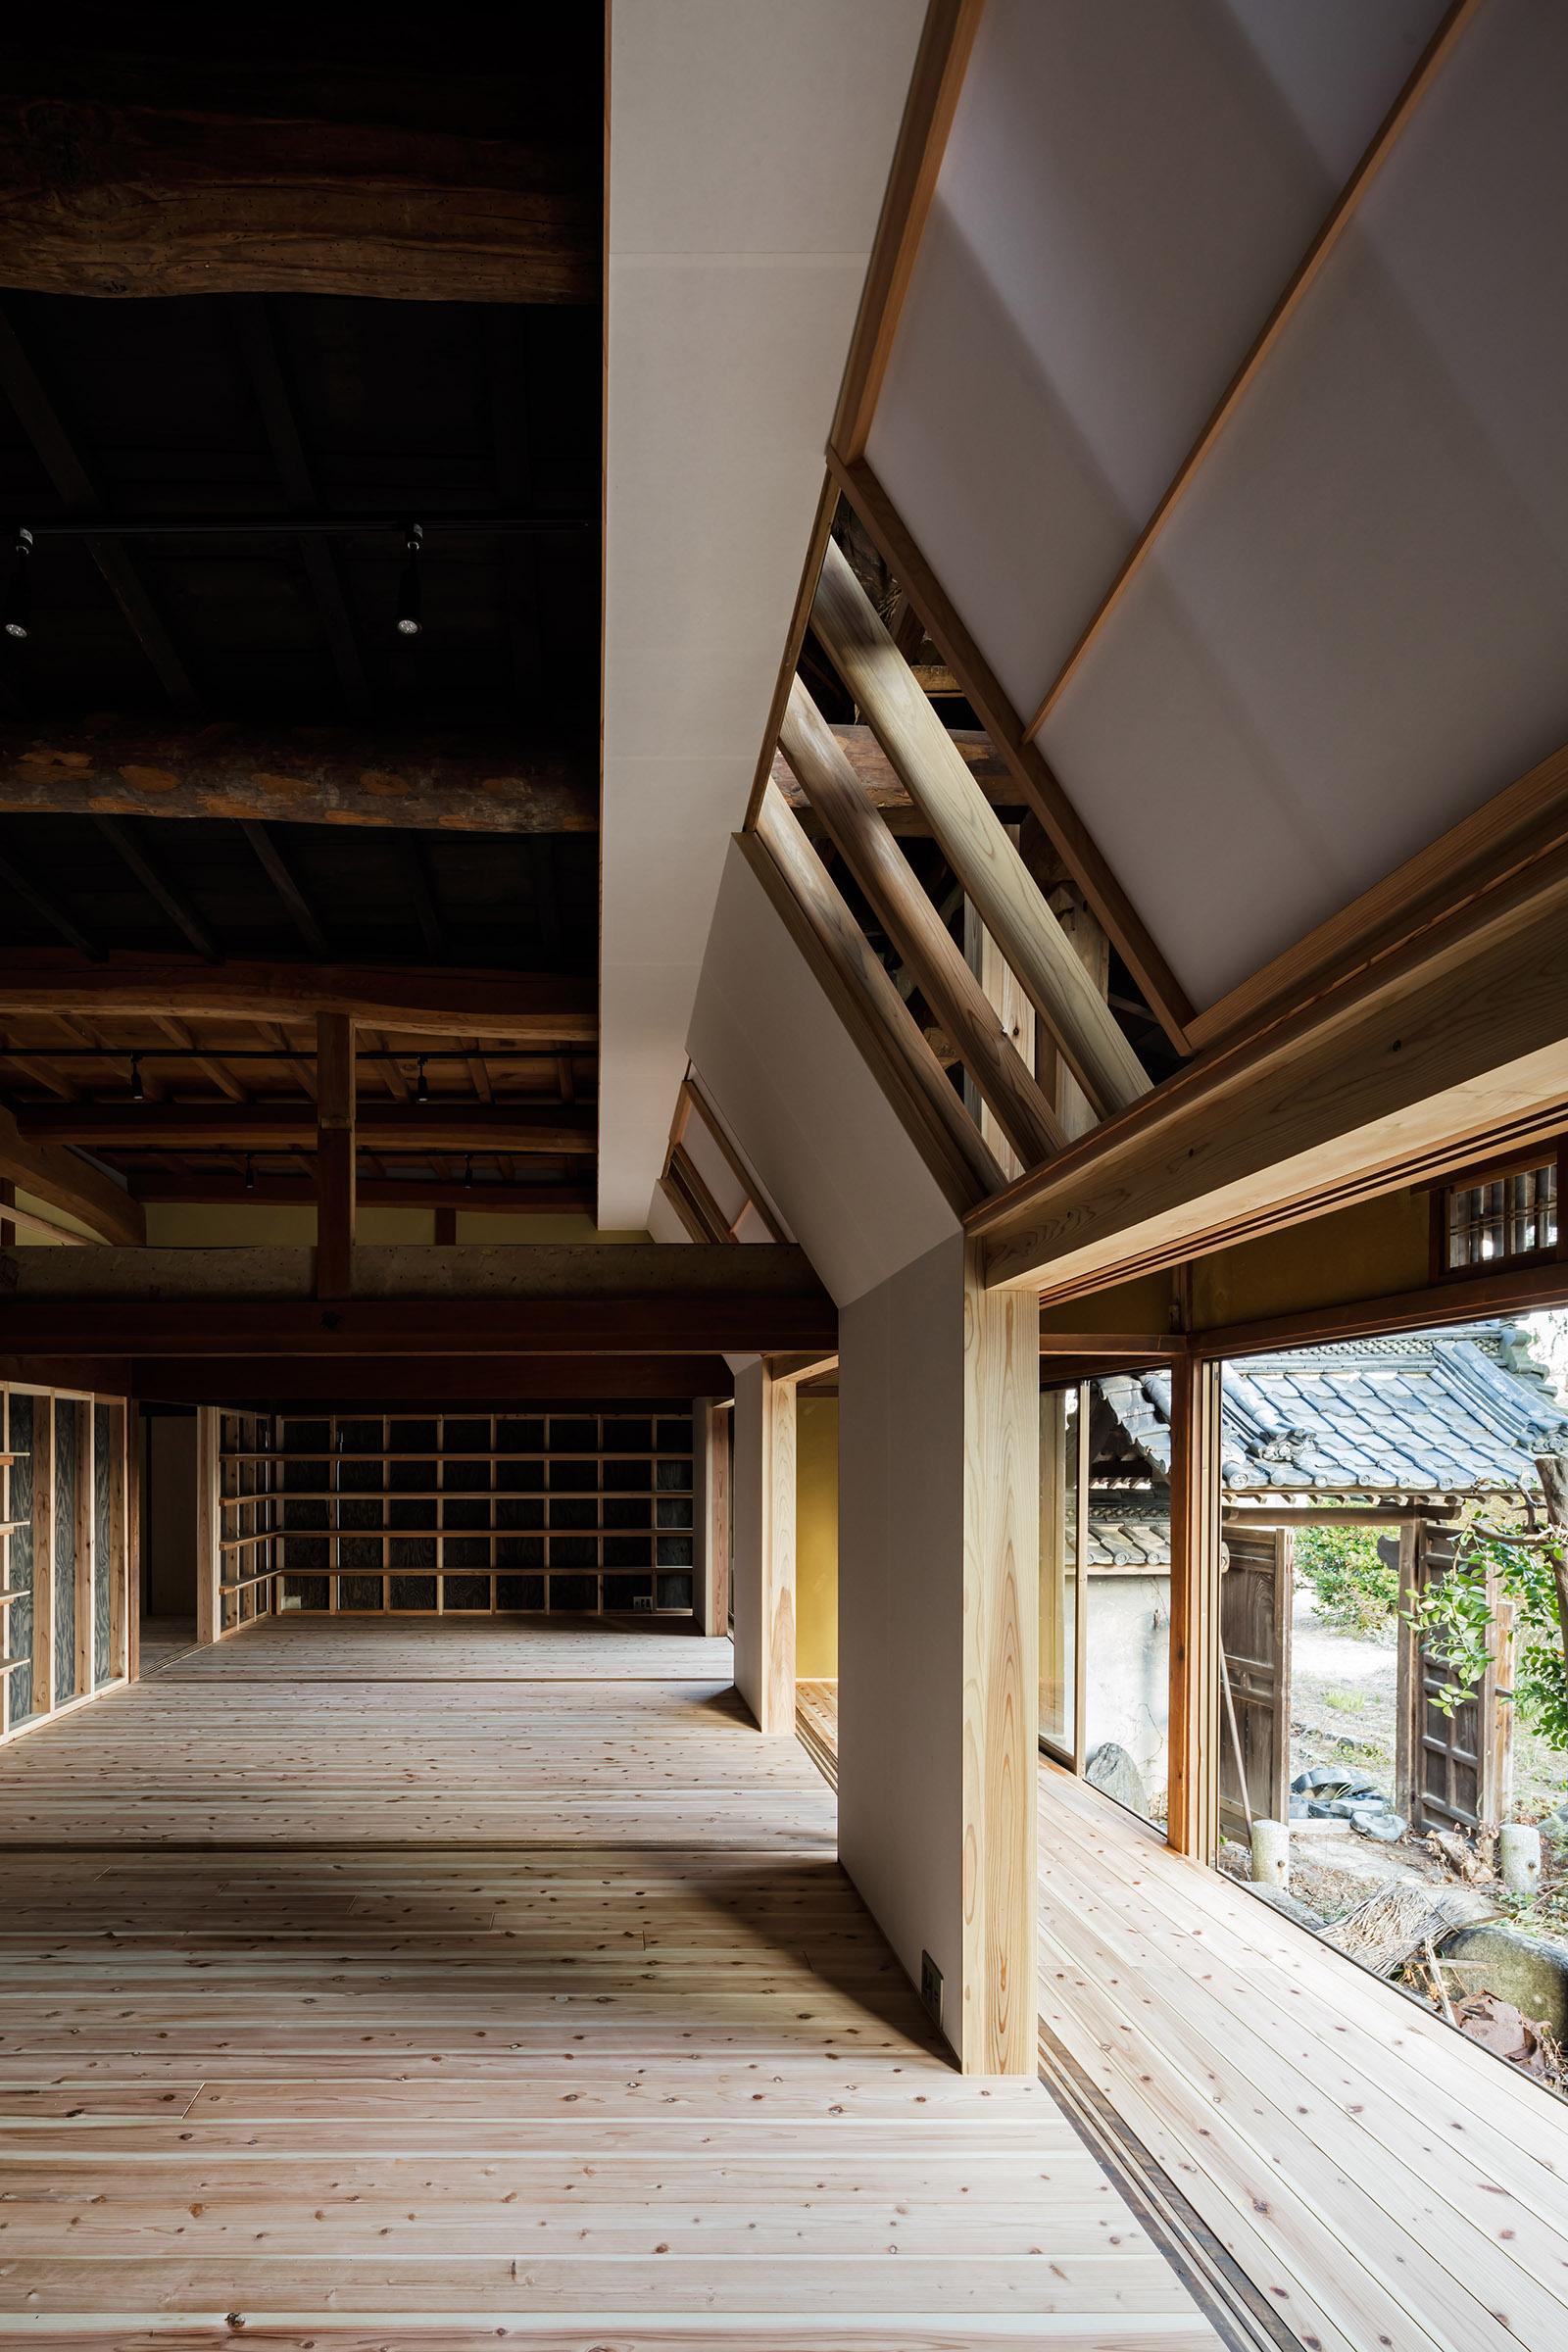 House in Nara City, Japan, by Tadashi Yoshimura Architects